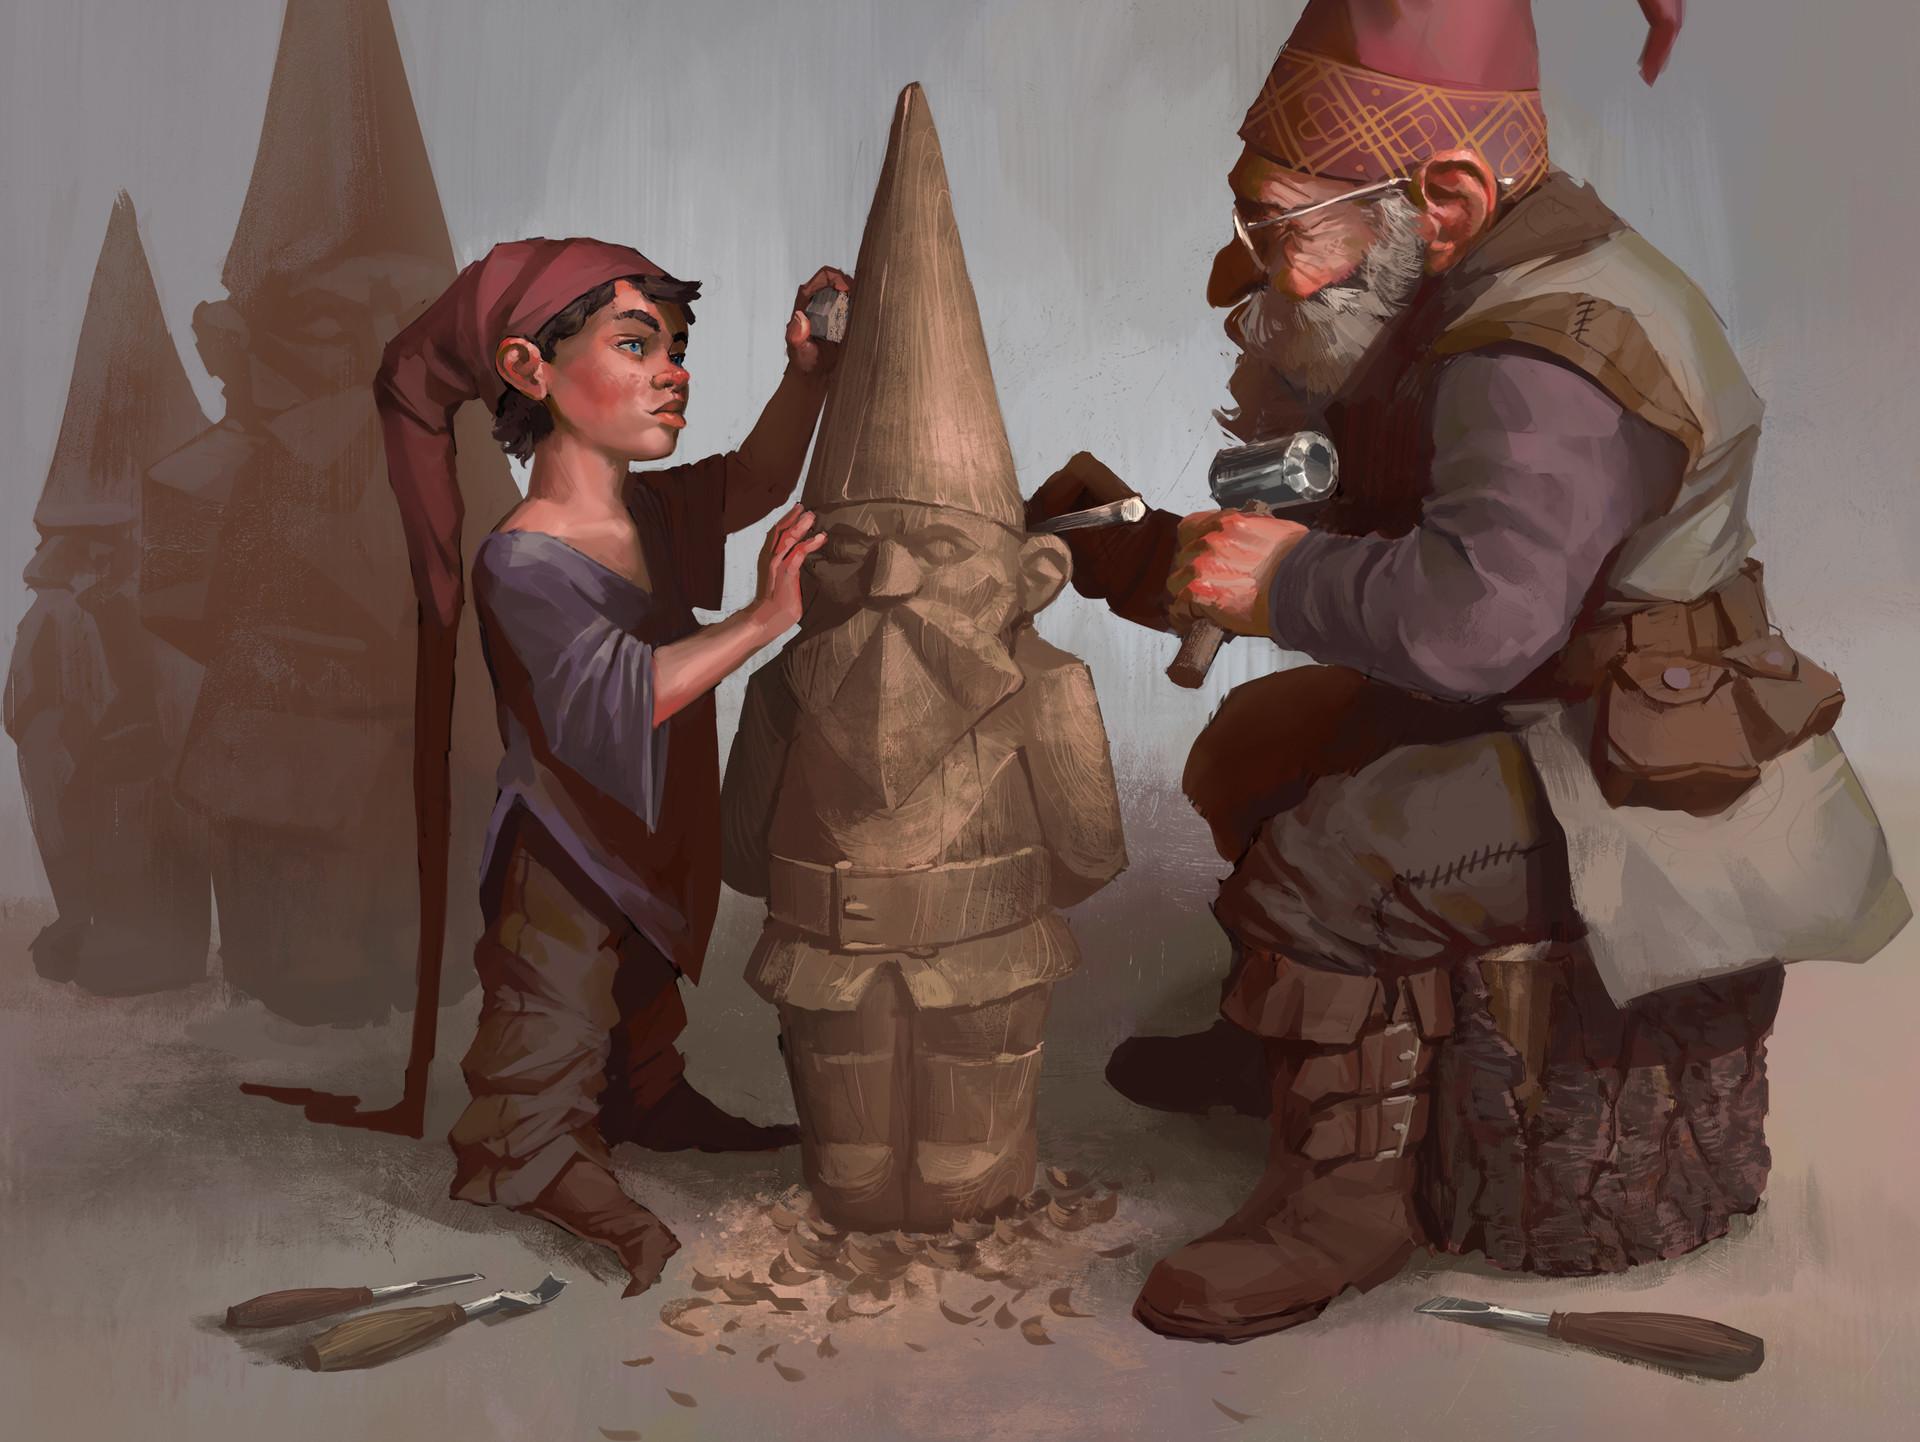 Pedro kruger garcia gnomes sculpting close up